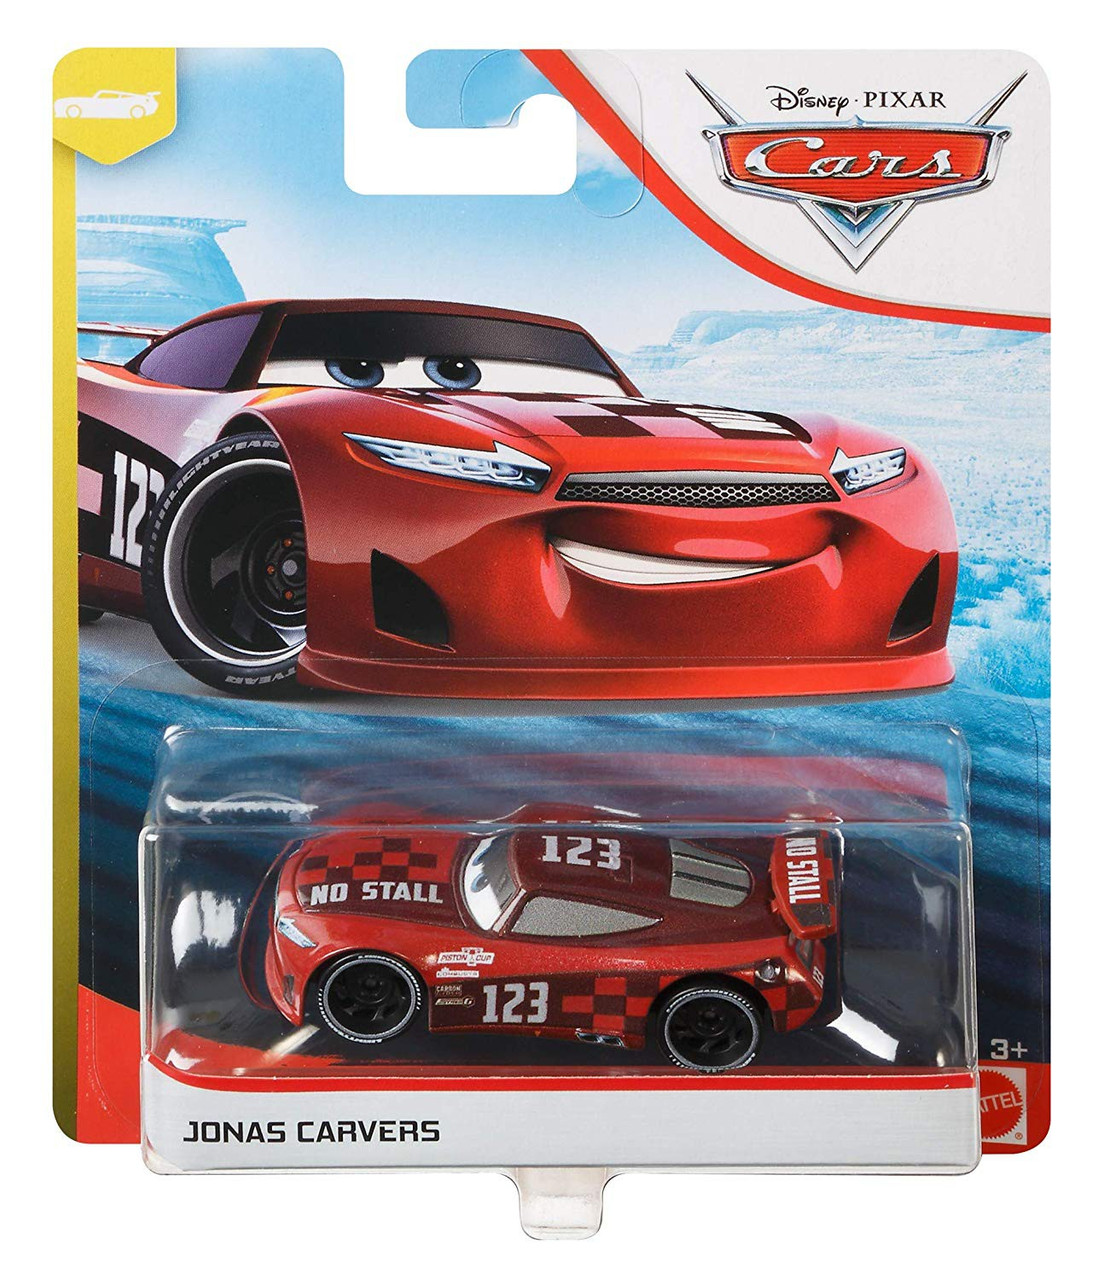 Disney Pixar Cars Cars 3 Next Gen Piston Cup Racers Jonas Carvers Diecast Car Mattel Toywiz